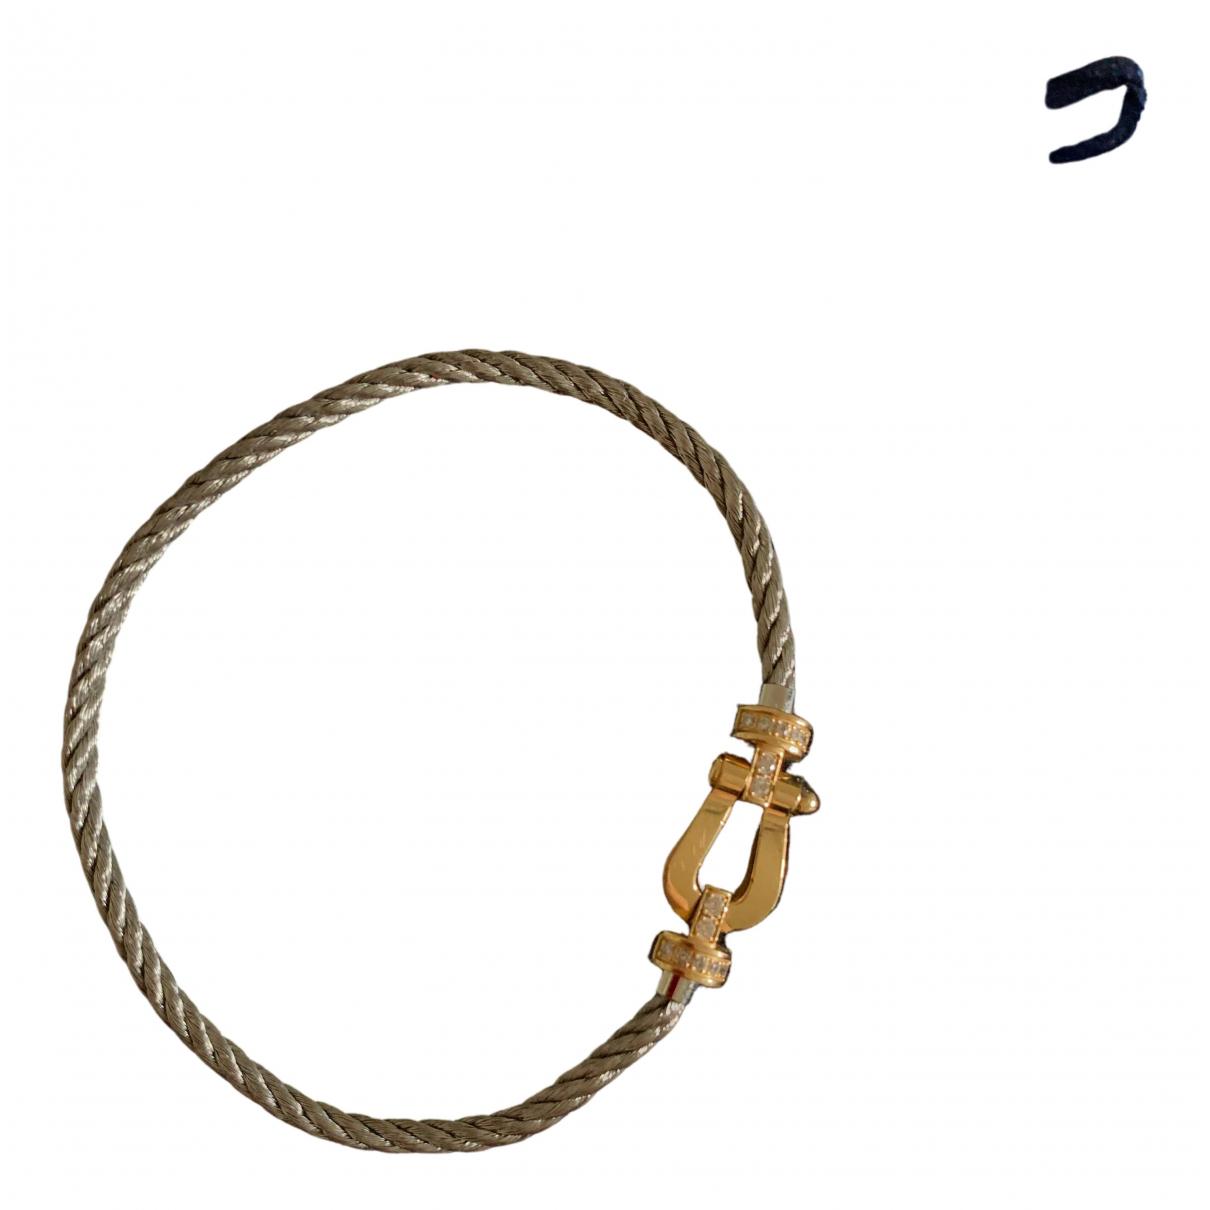 Fred - Bracelet Force 10 pour femme en or jaune - dore